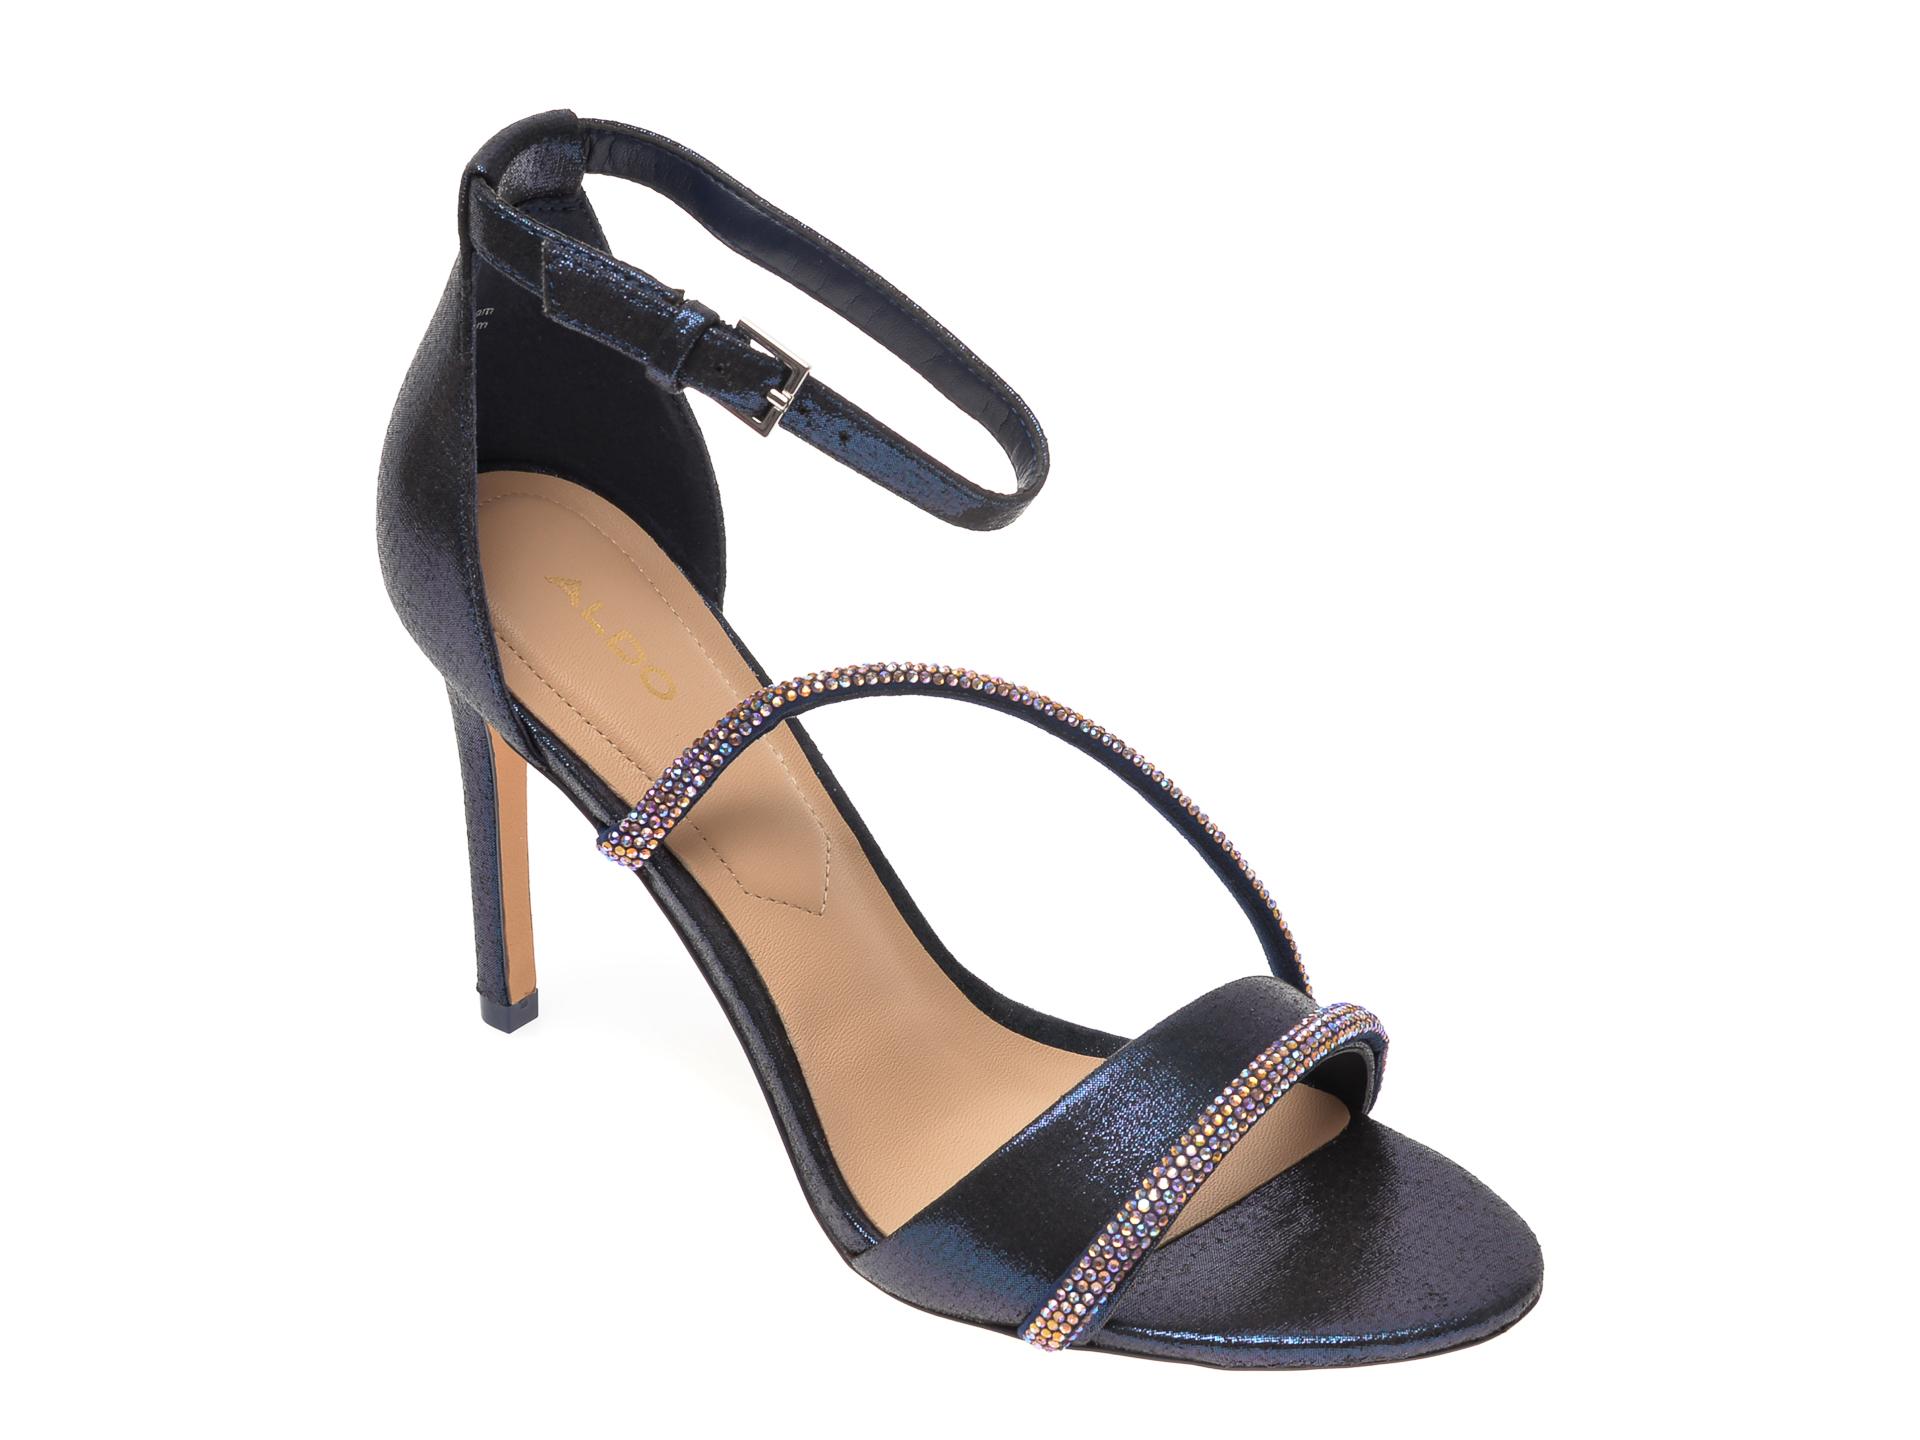 Sandale ALDO bleumarin, Kuprina410, din material textil New